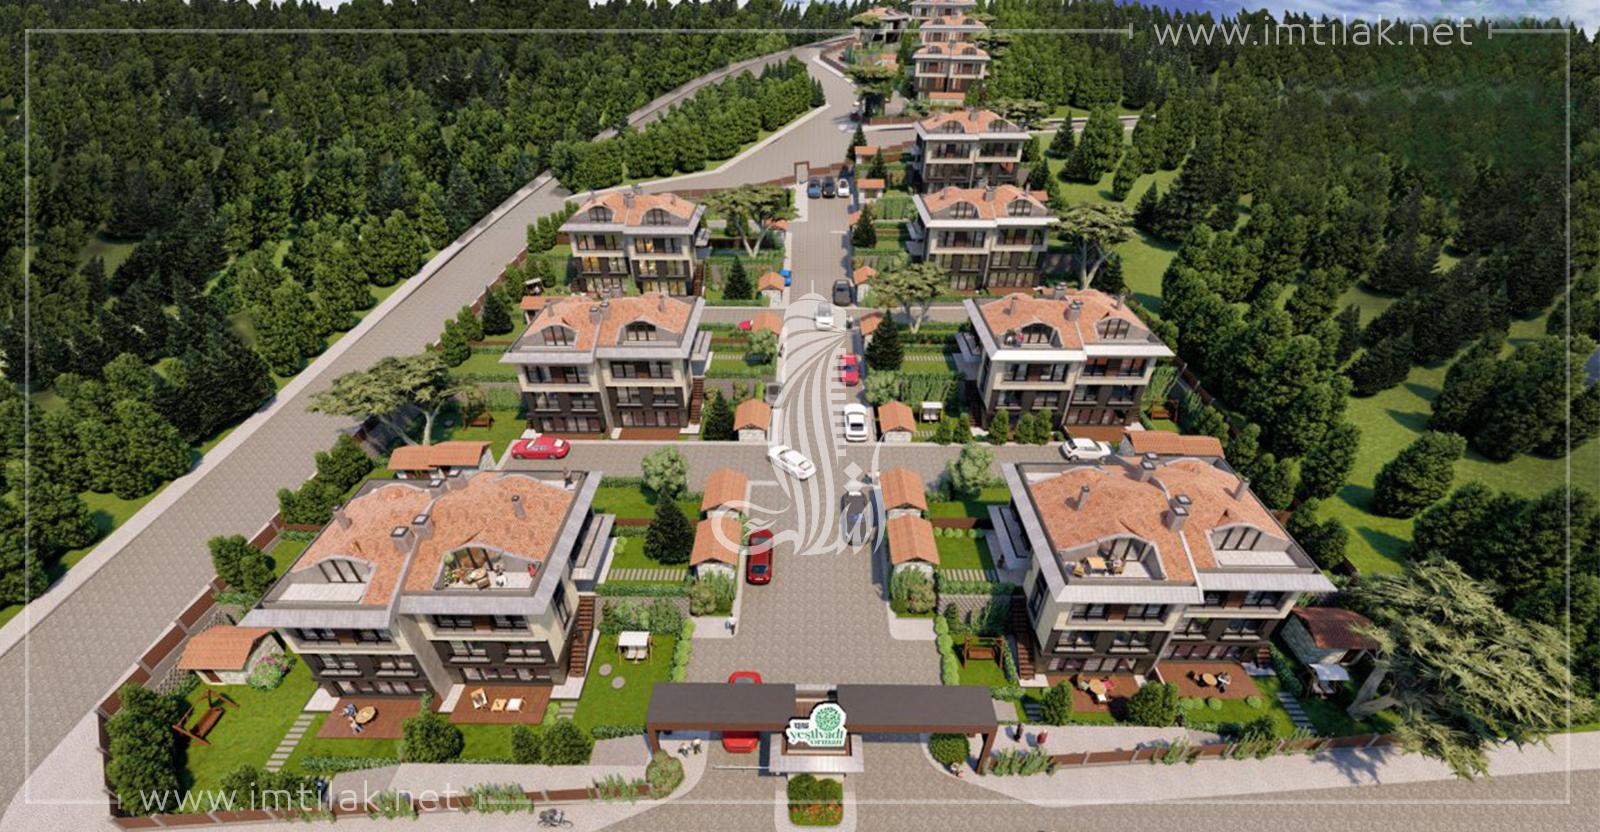 Yesil Vadi Villas  IMT - 513